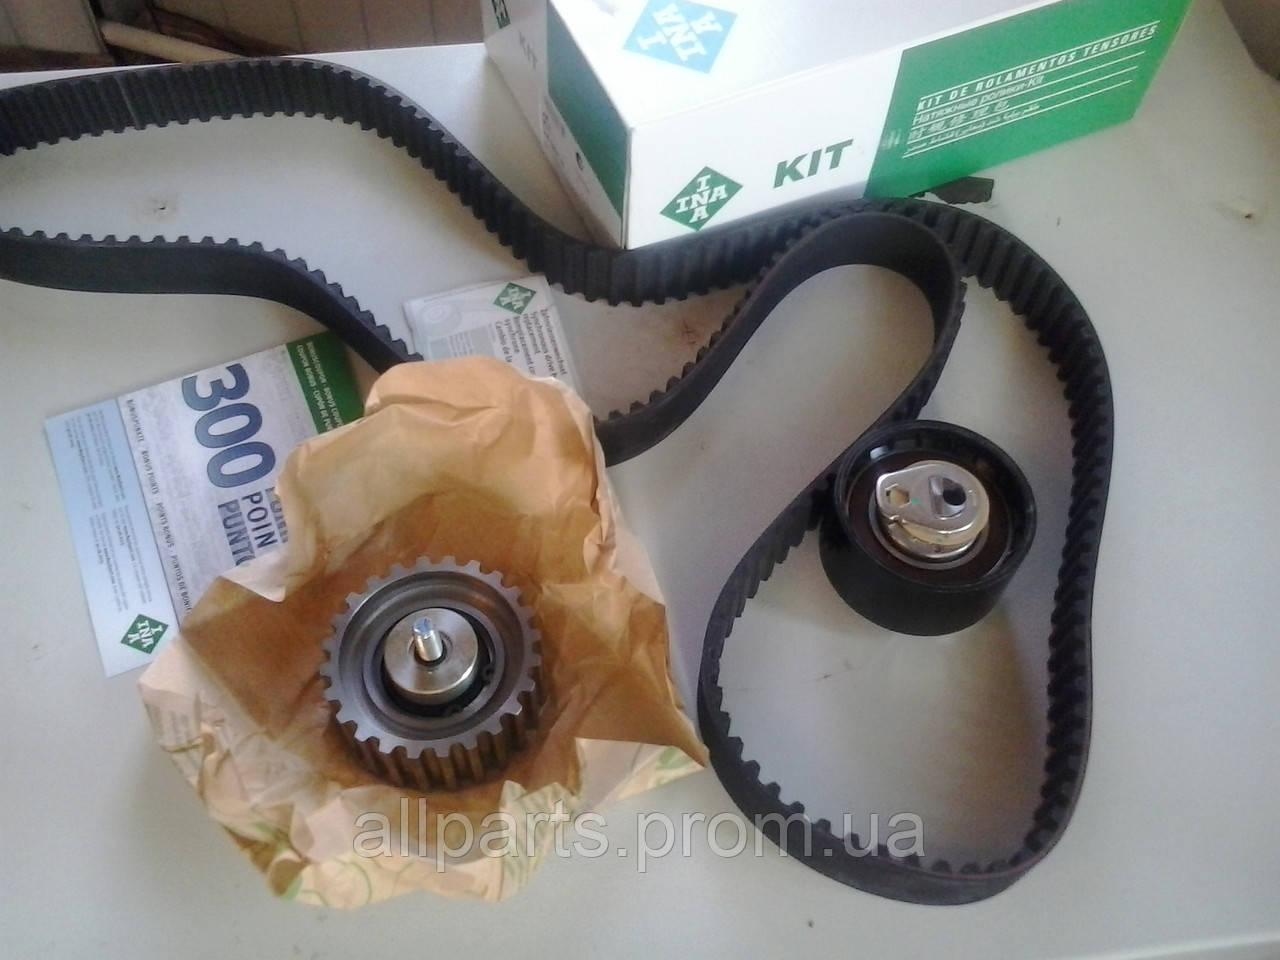 Комплект ременя ГРМ Iveco Daily / Fiat Ducato 2.3JTD (02- ) производителя INA (Германия)